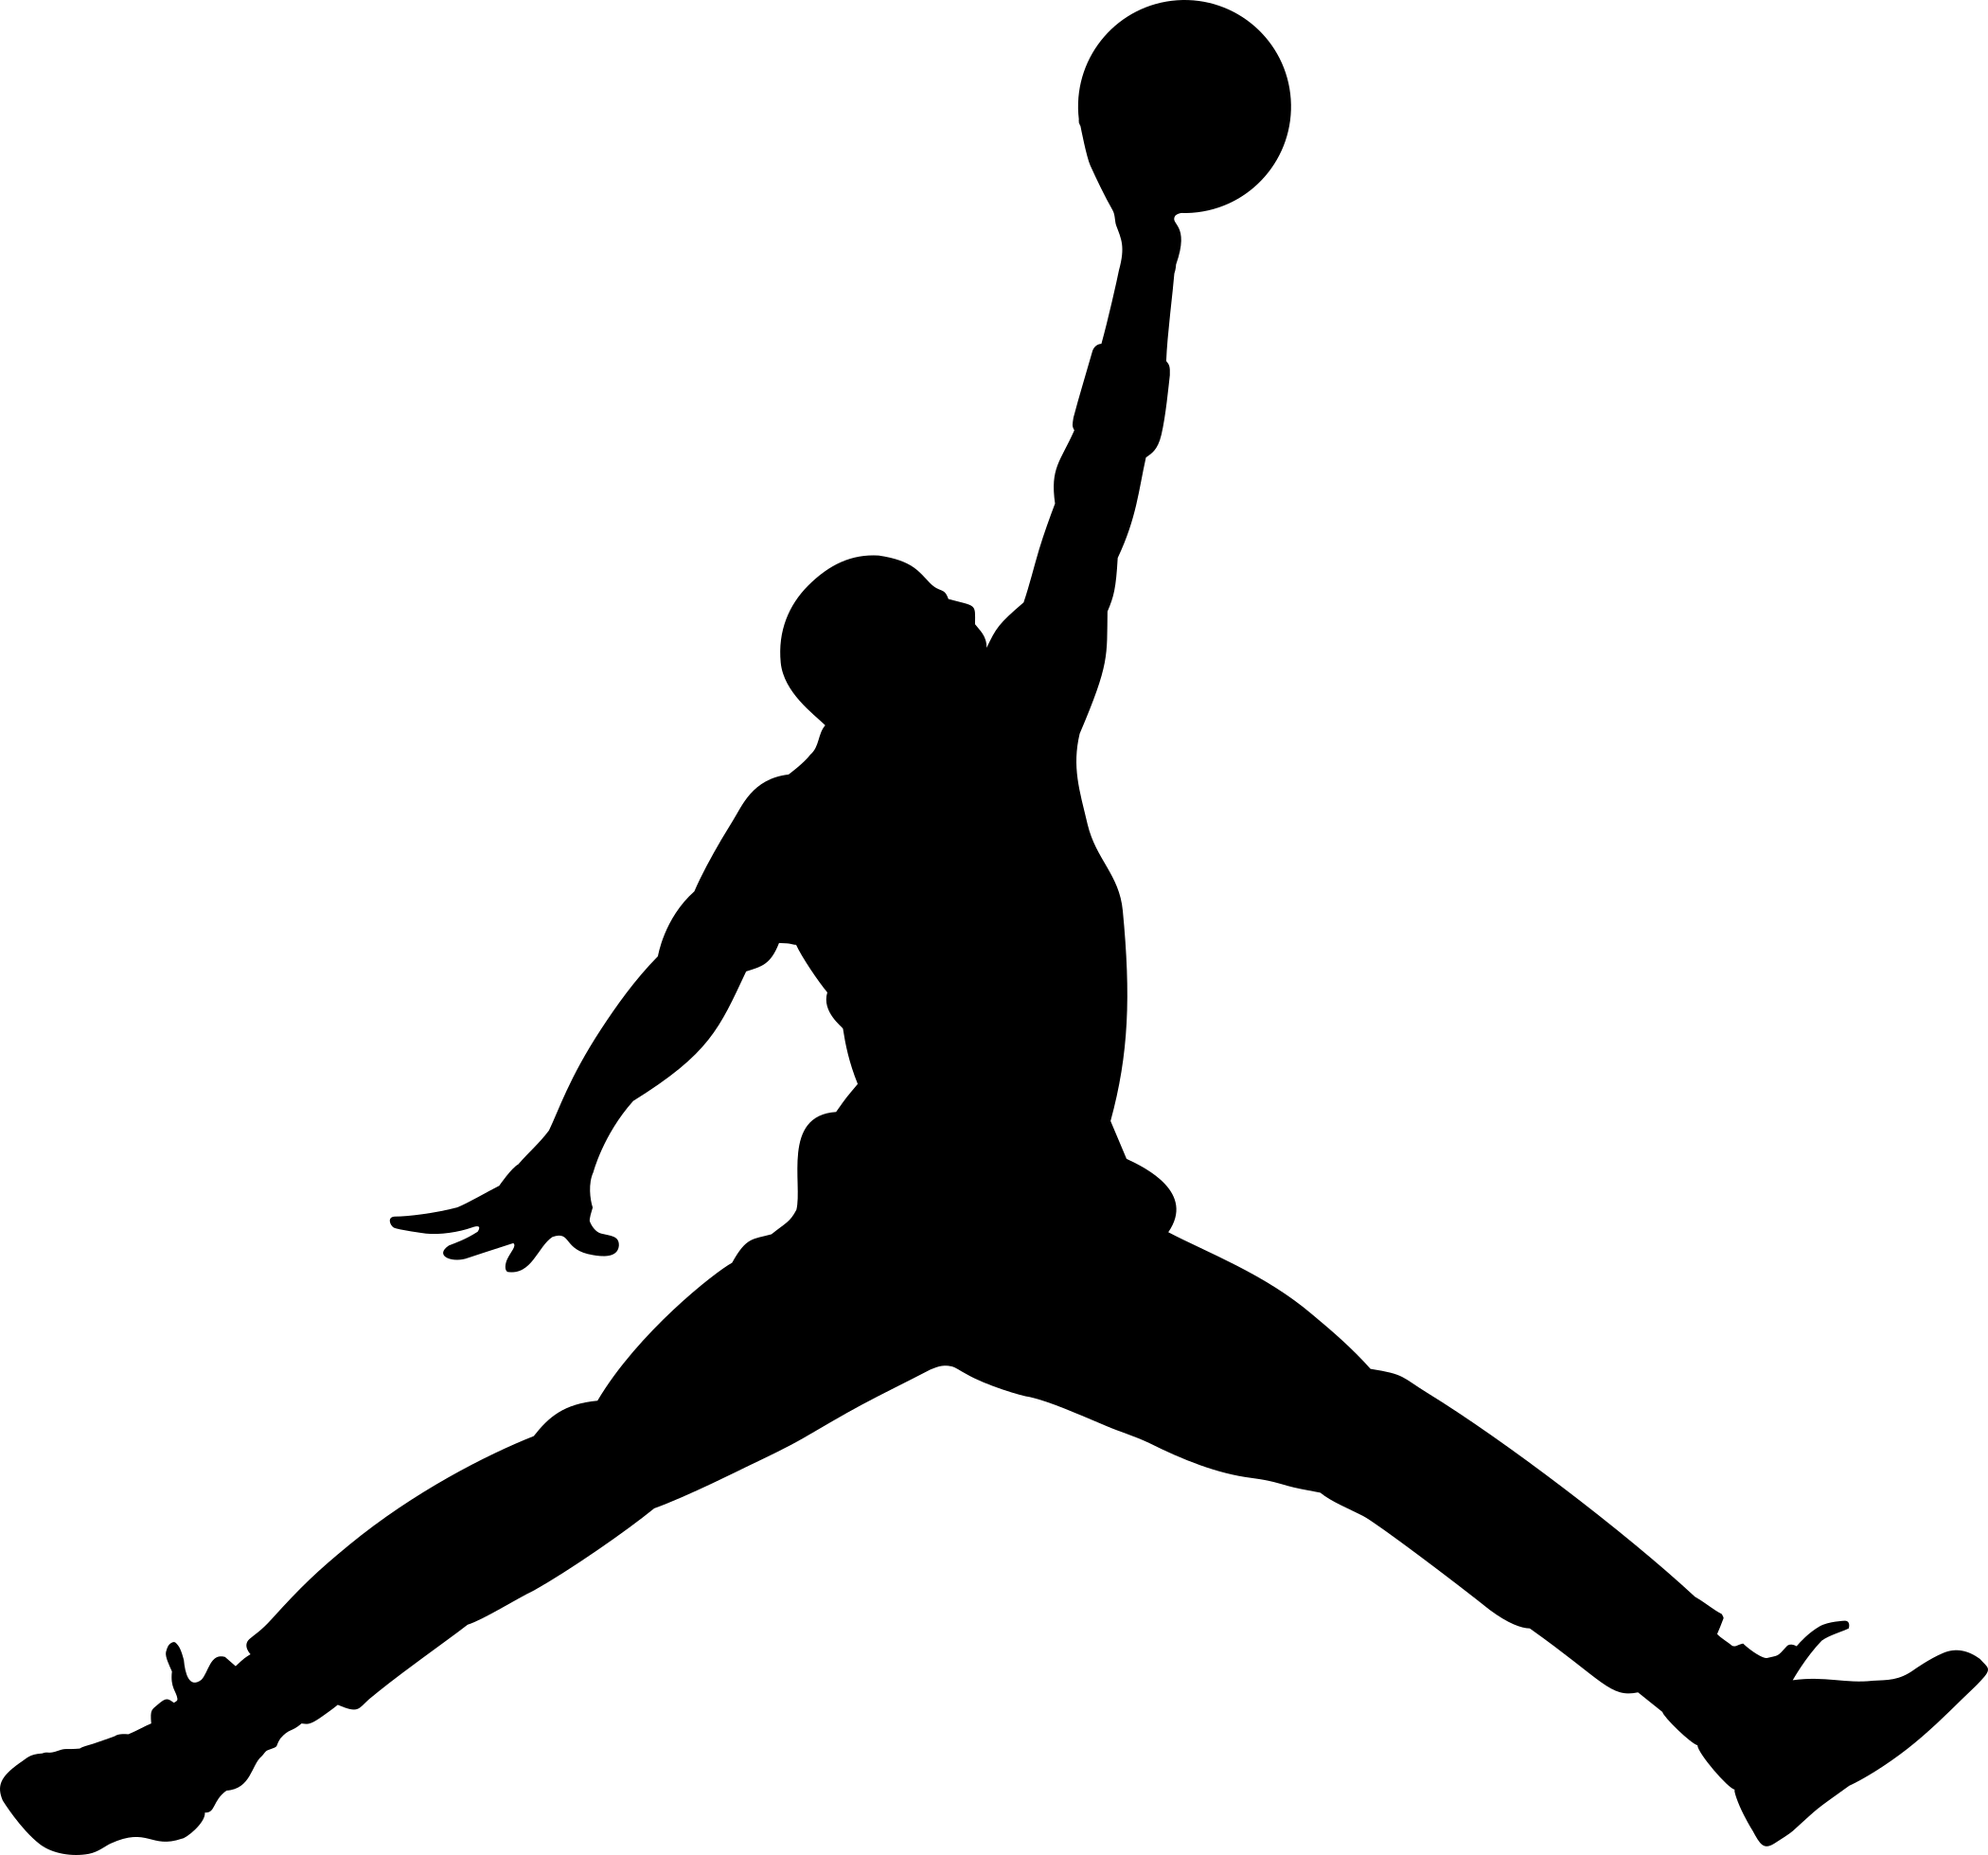 jordan logo 1 - Jordan Logo